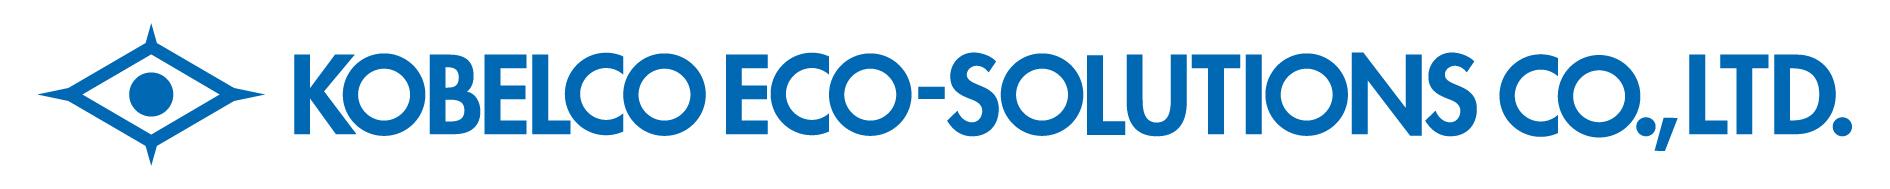 Kobelco Eco-Solutions Co , Ltd